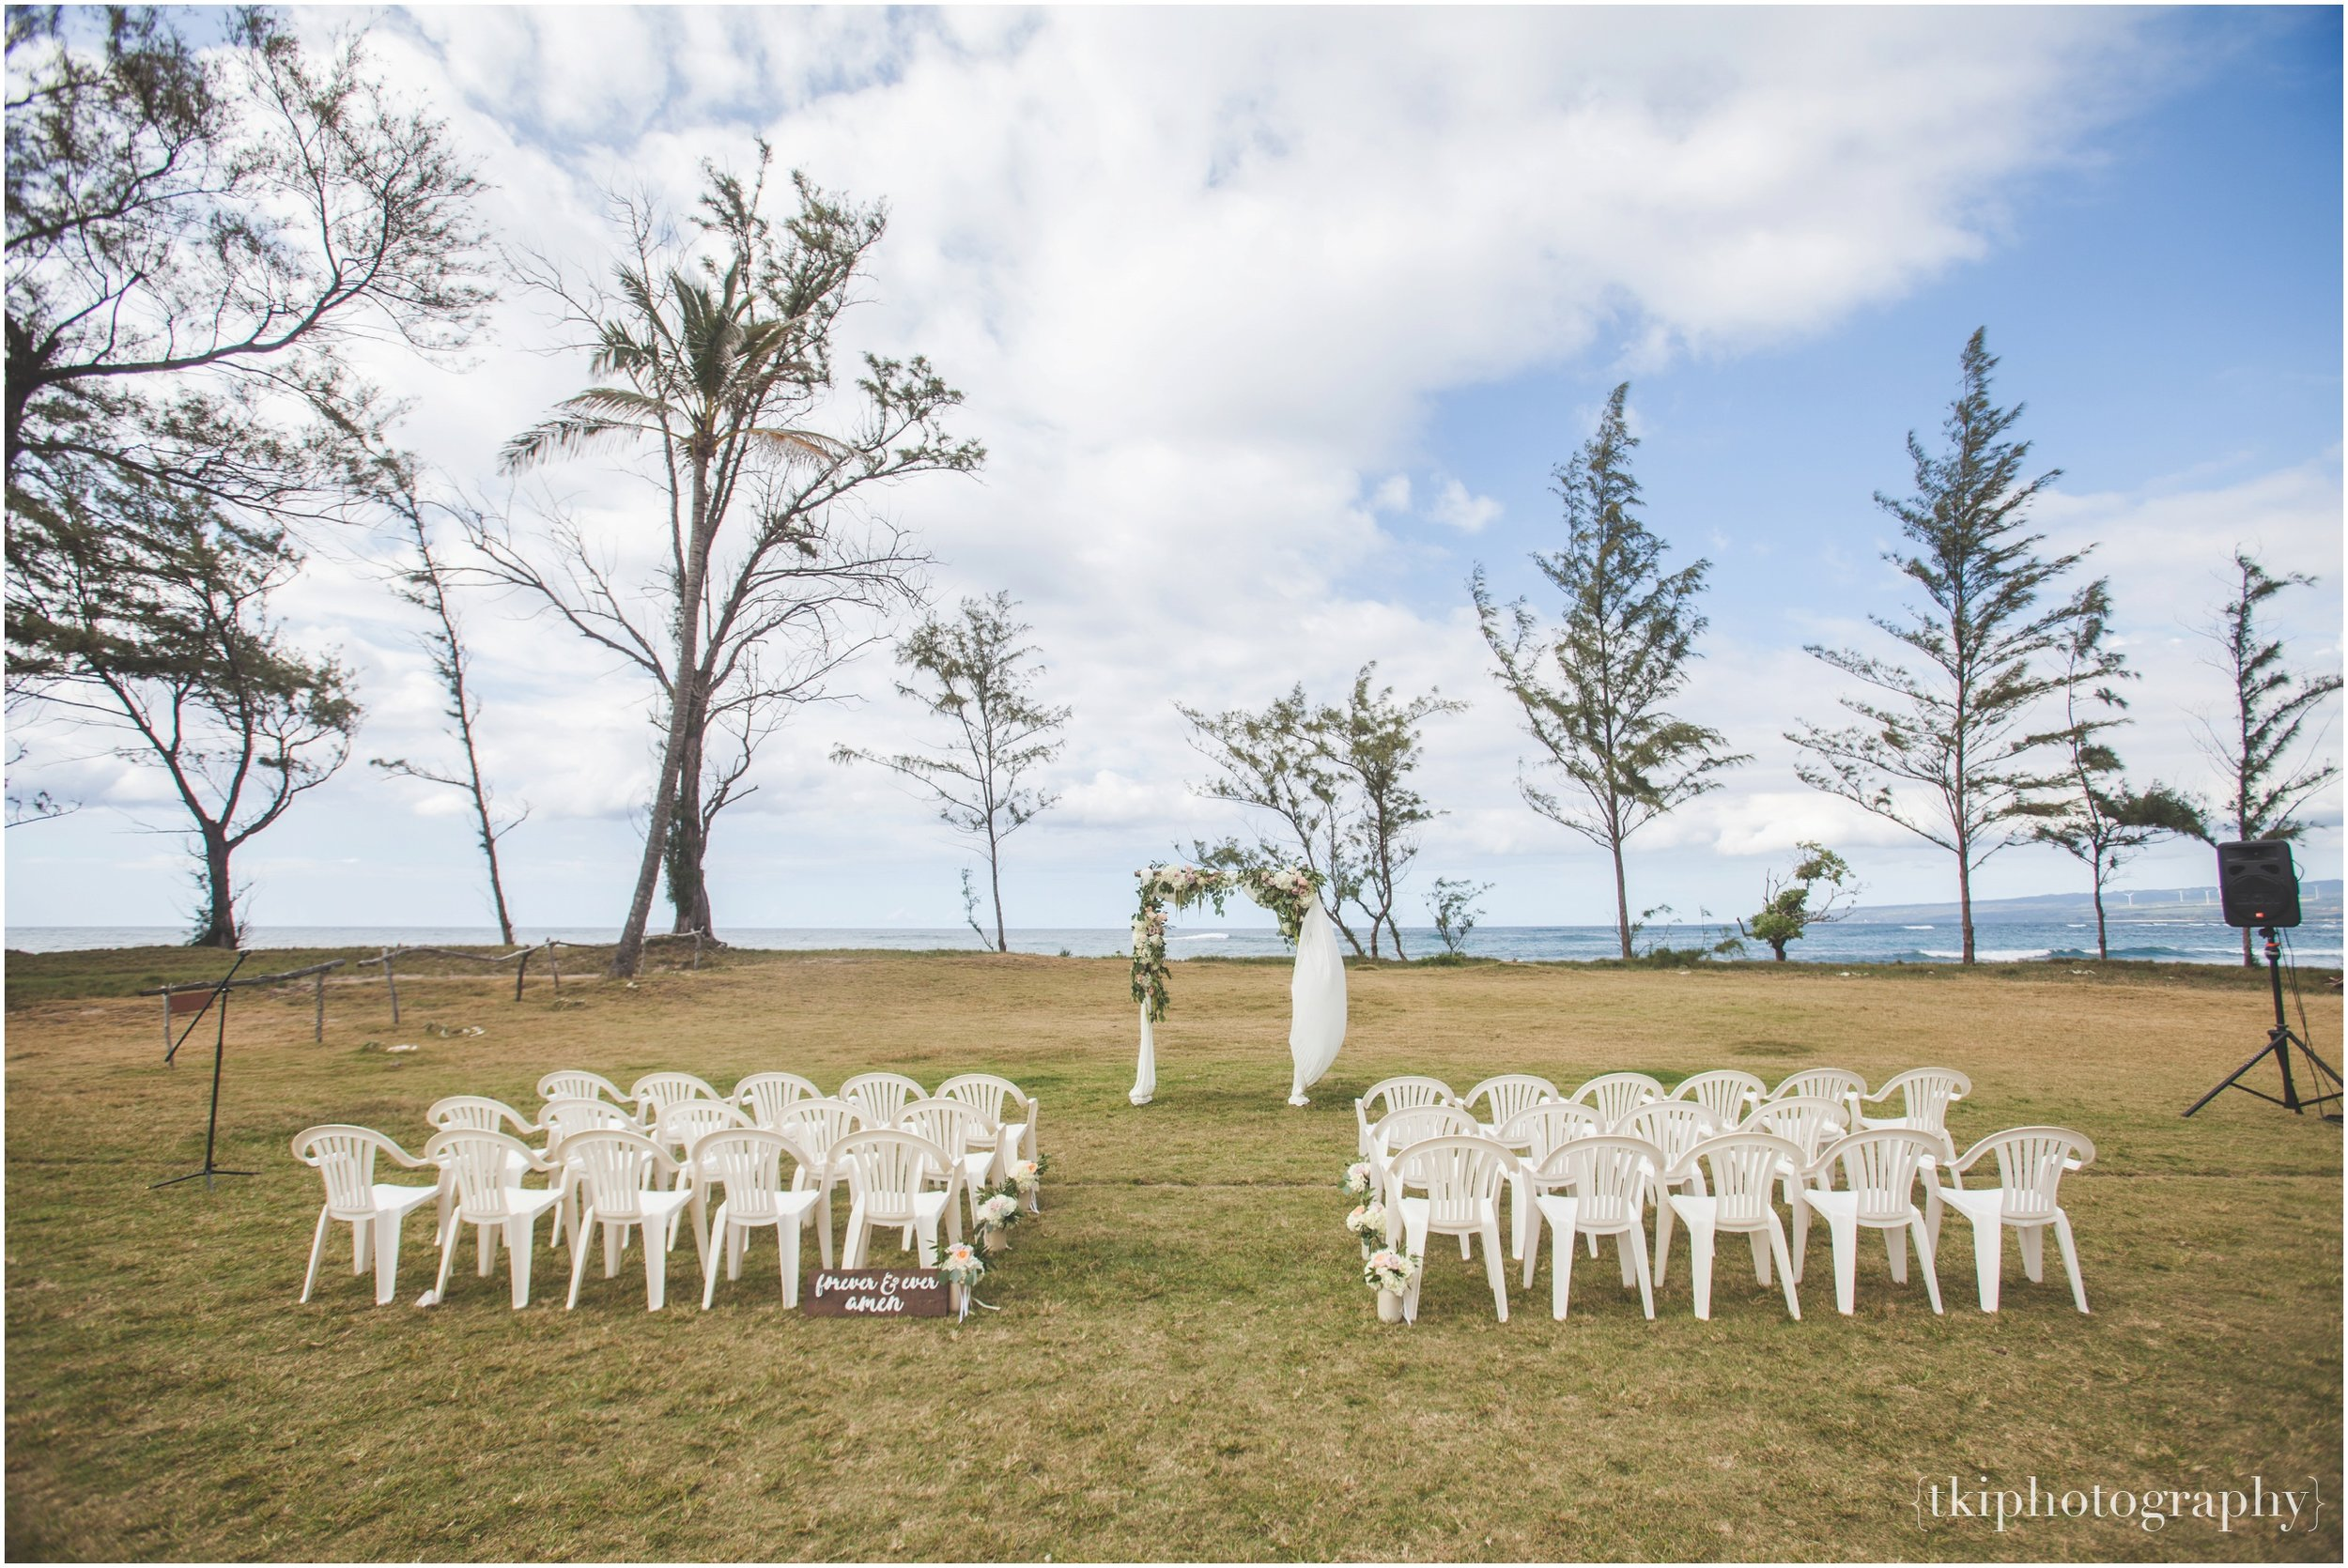 Wedding Ceremony at hawaii polo field